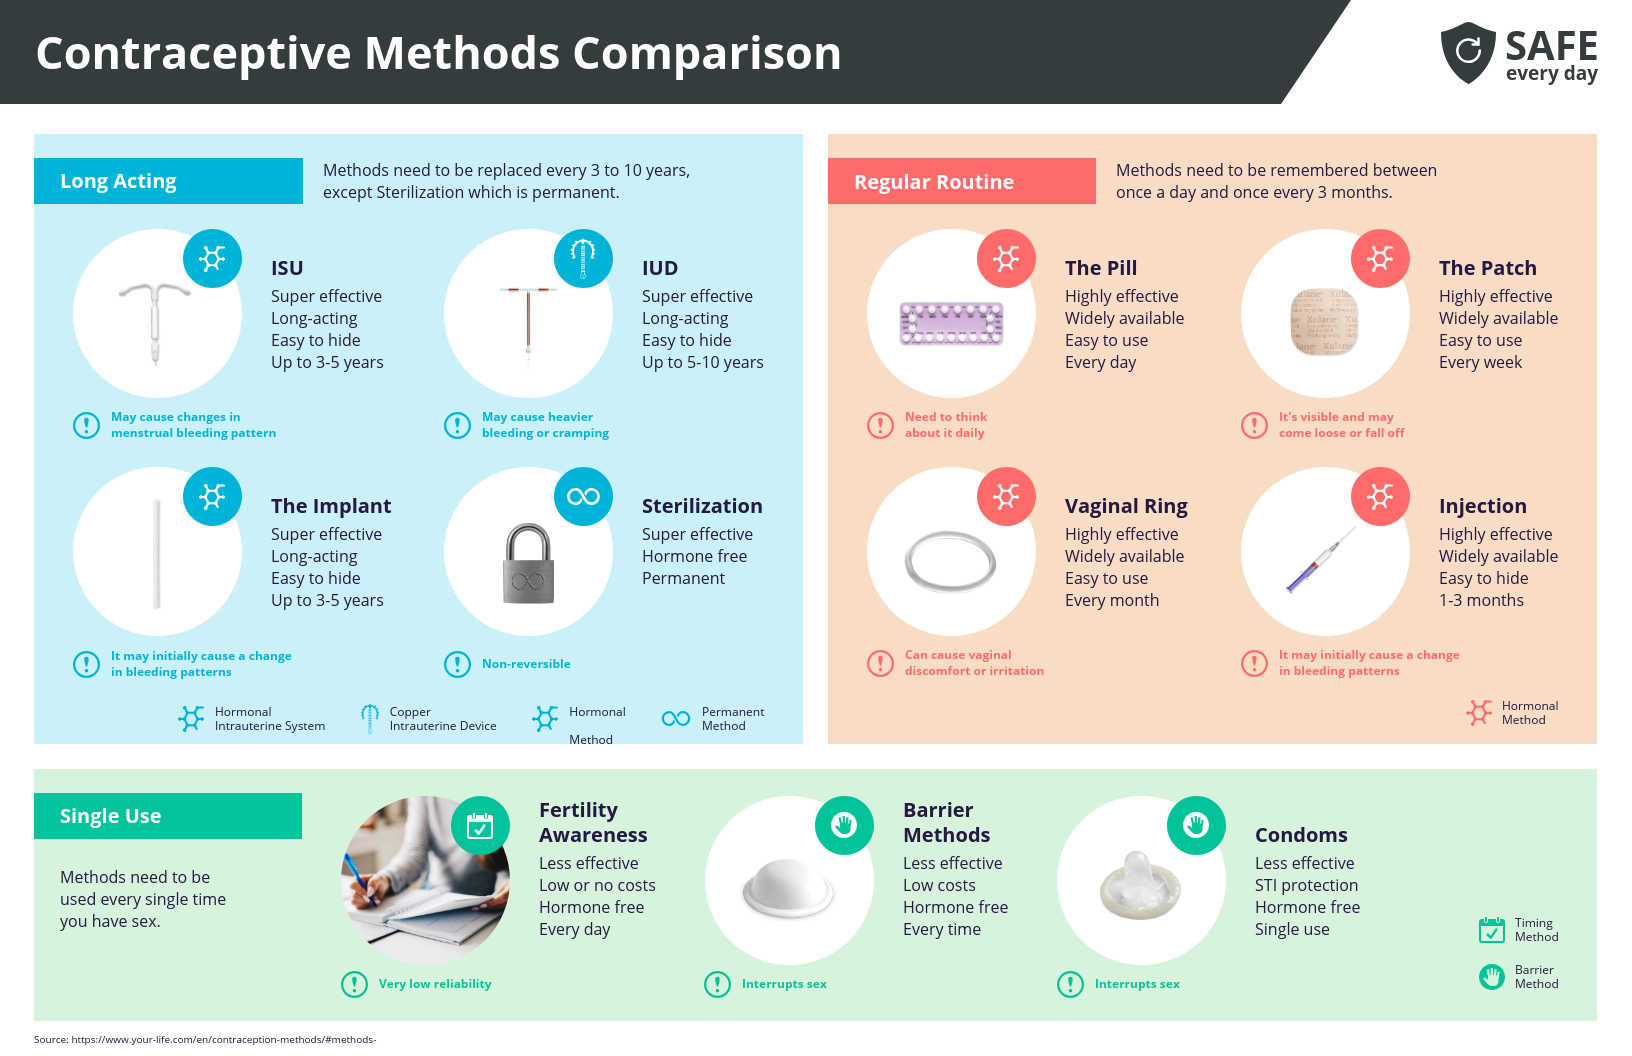 Healthcare Data Visualization Contraceptive Methods Comparison Infographic